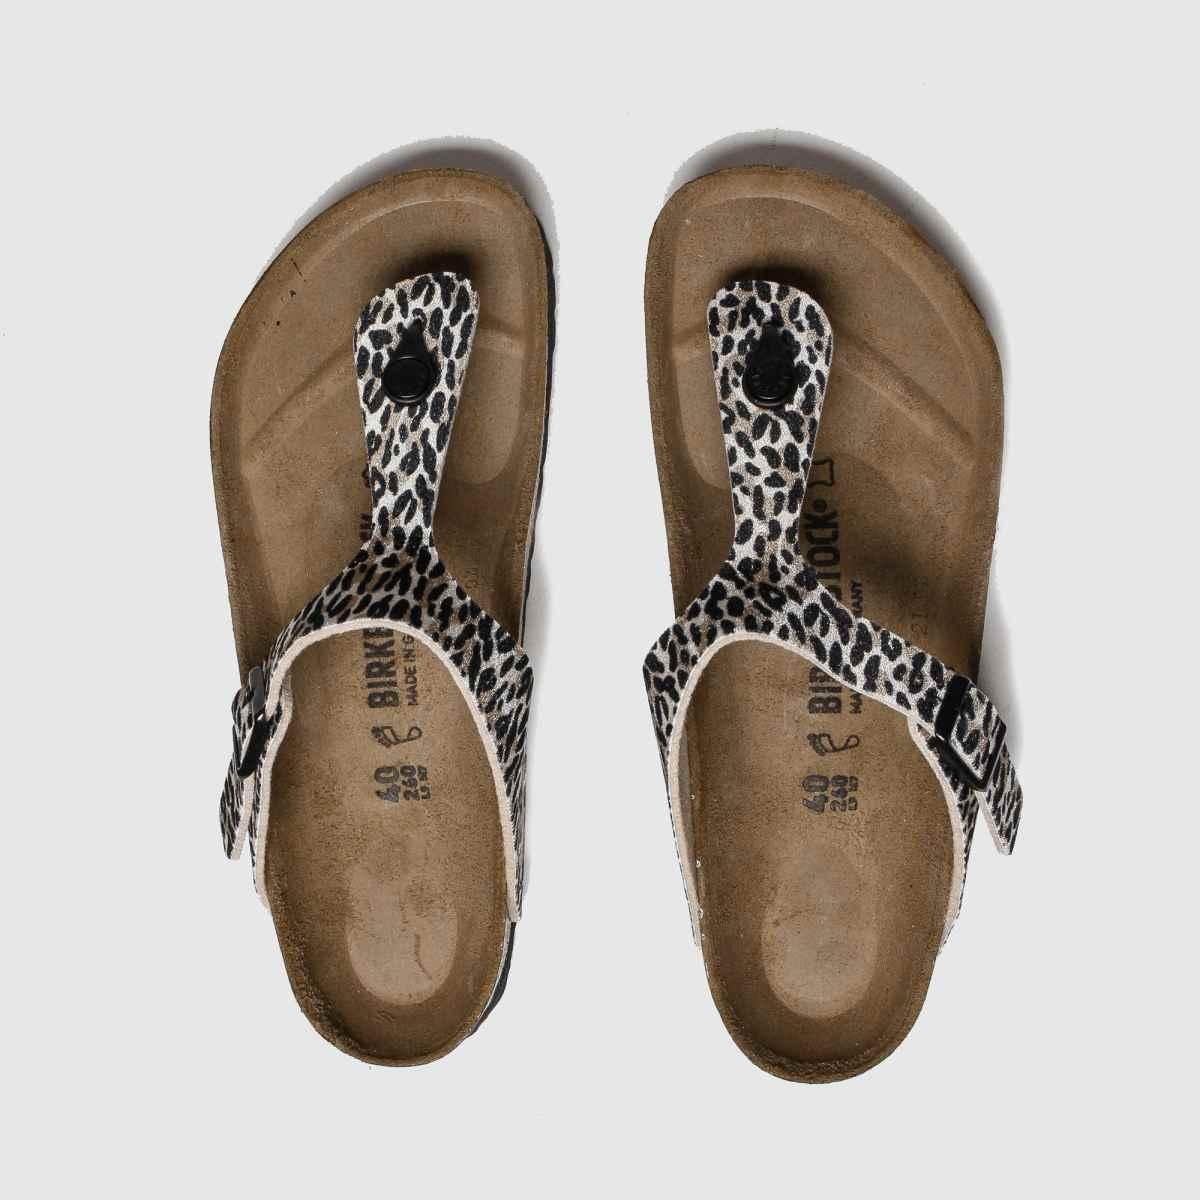 Birkenstock Brown & Black Leopard Print Gizeh Sandals